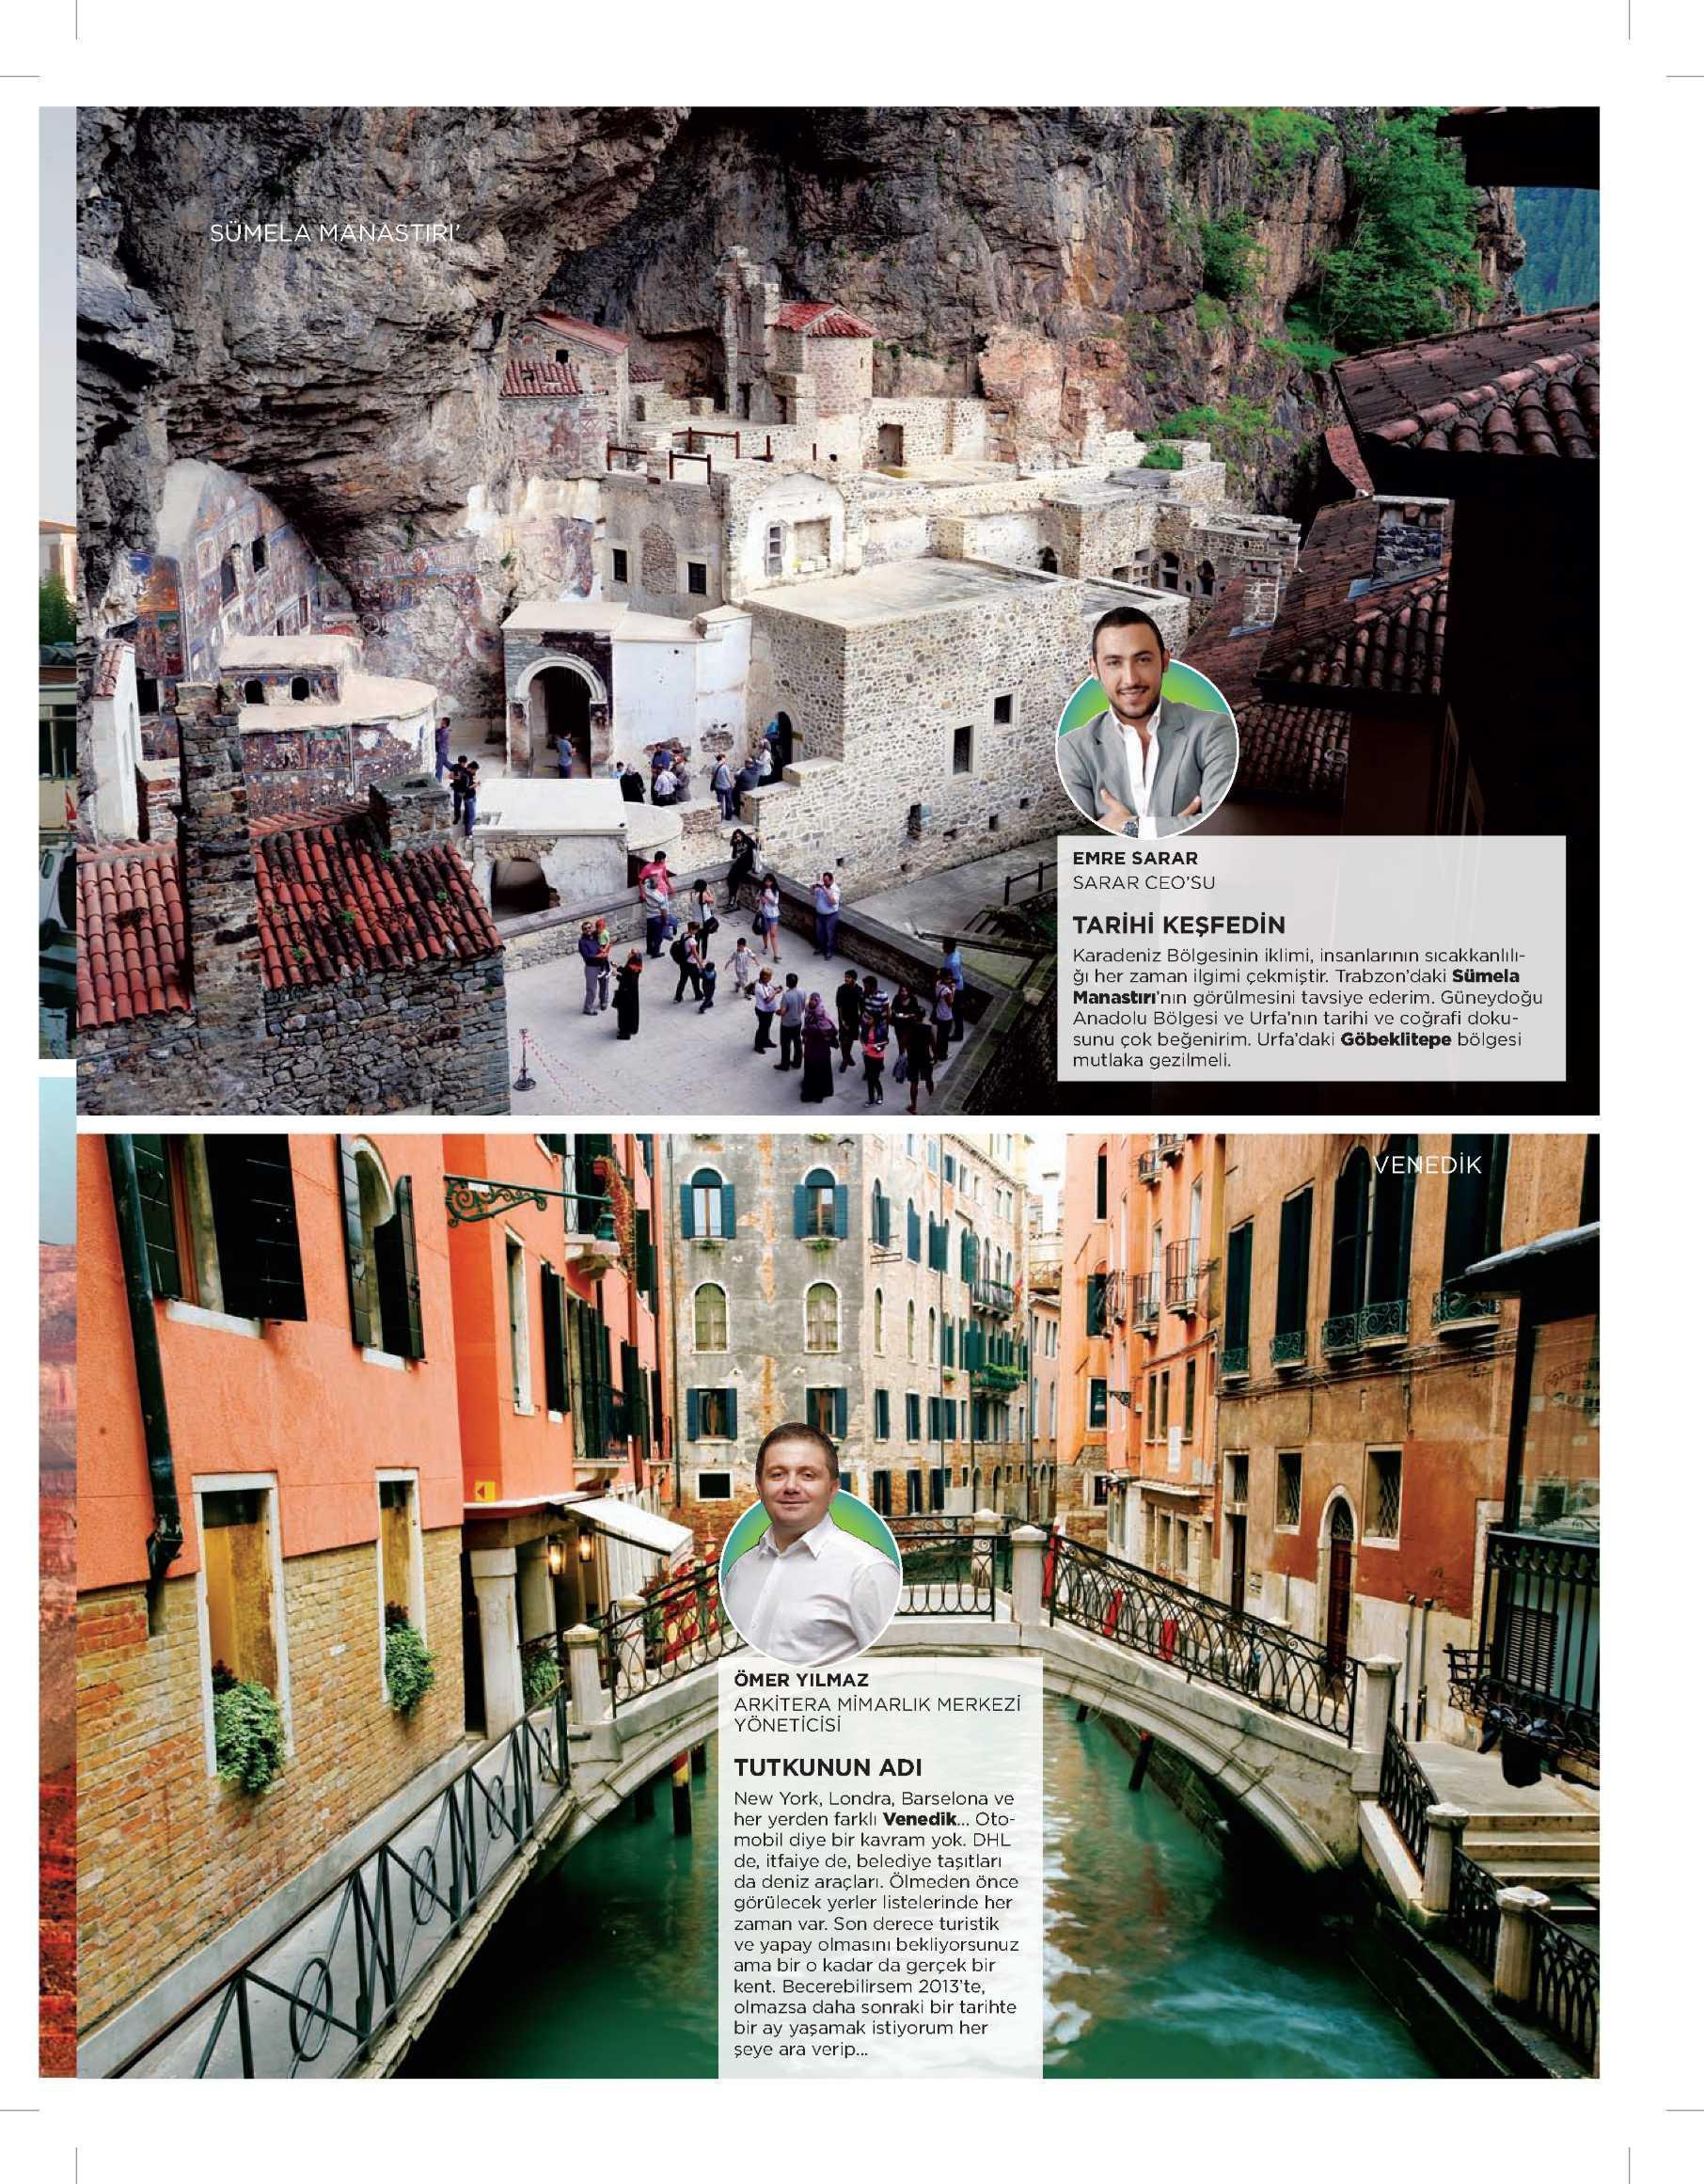 Netmarble-Turkey-Infomag-Dergisi-Aralik-2012-Sayfa-141-7